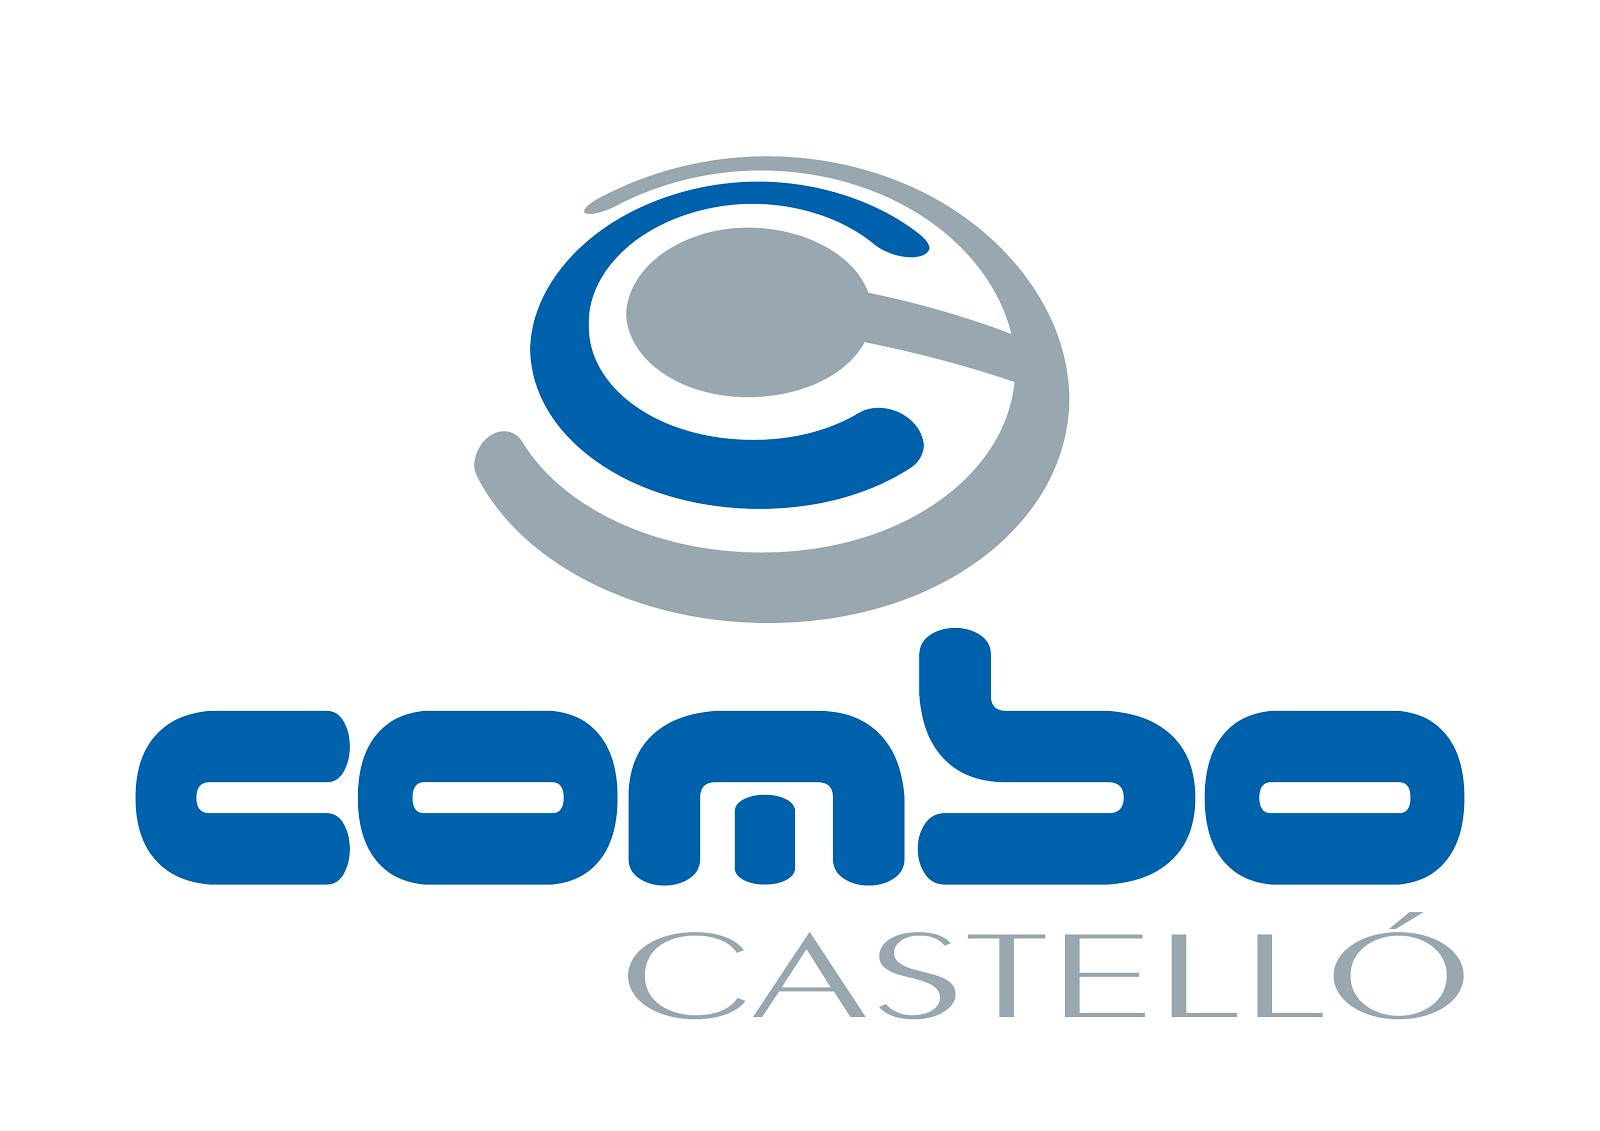 Combo Castelló